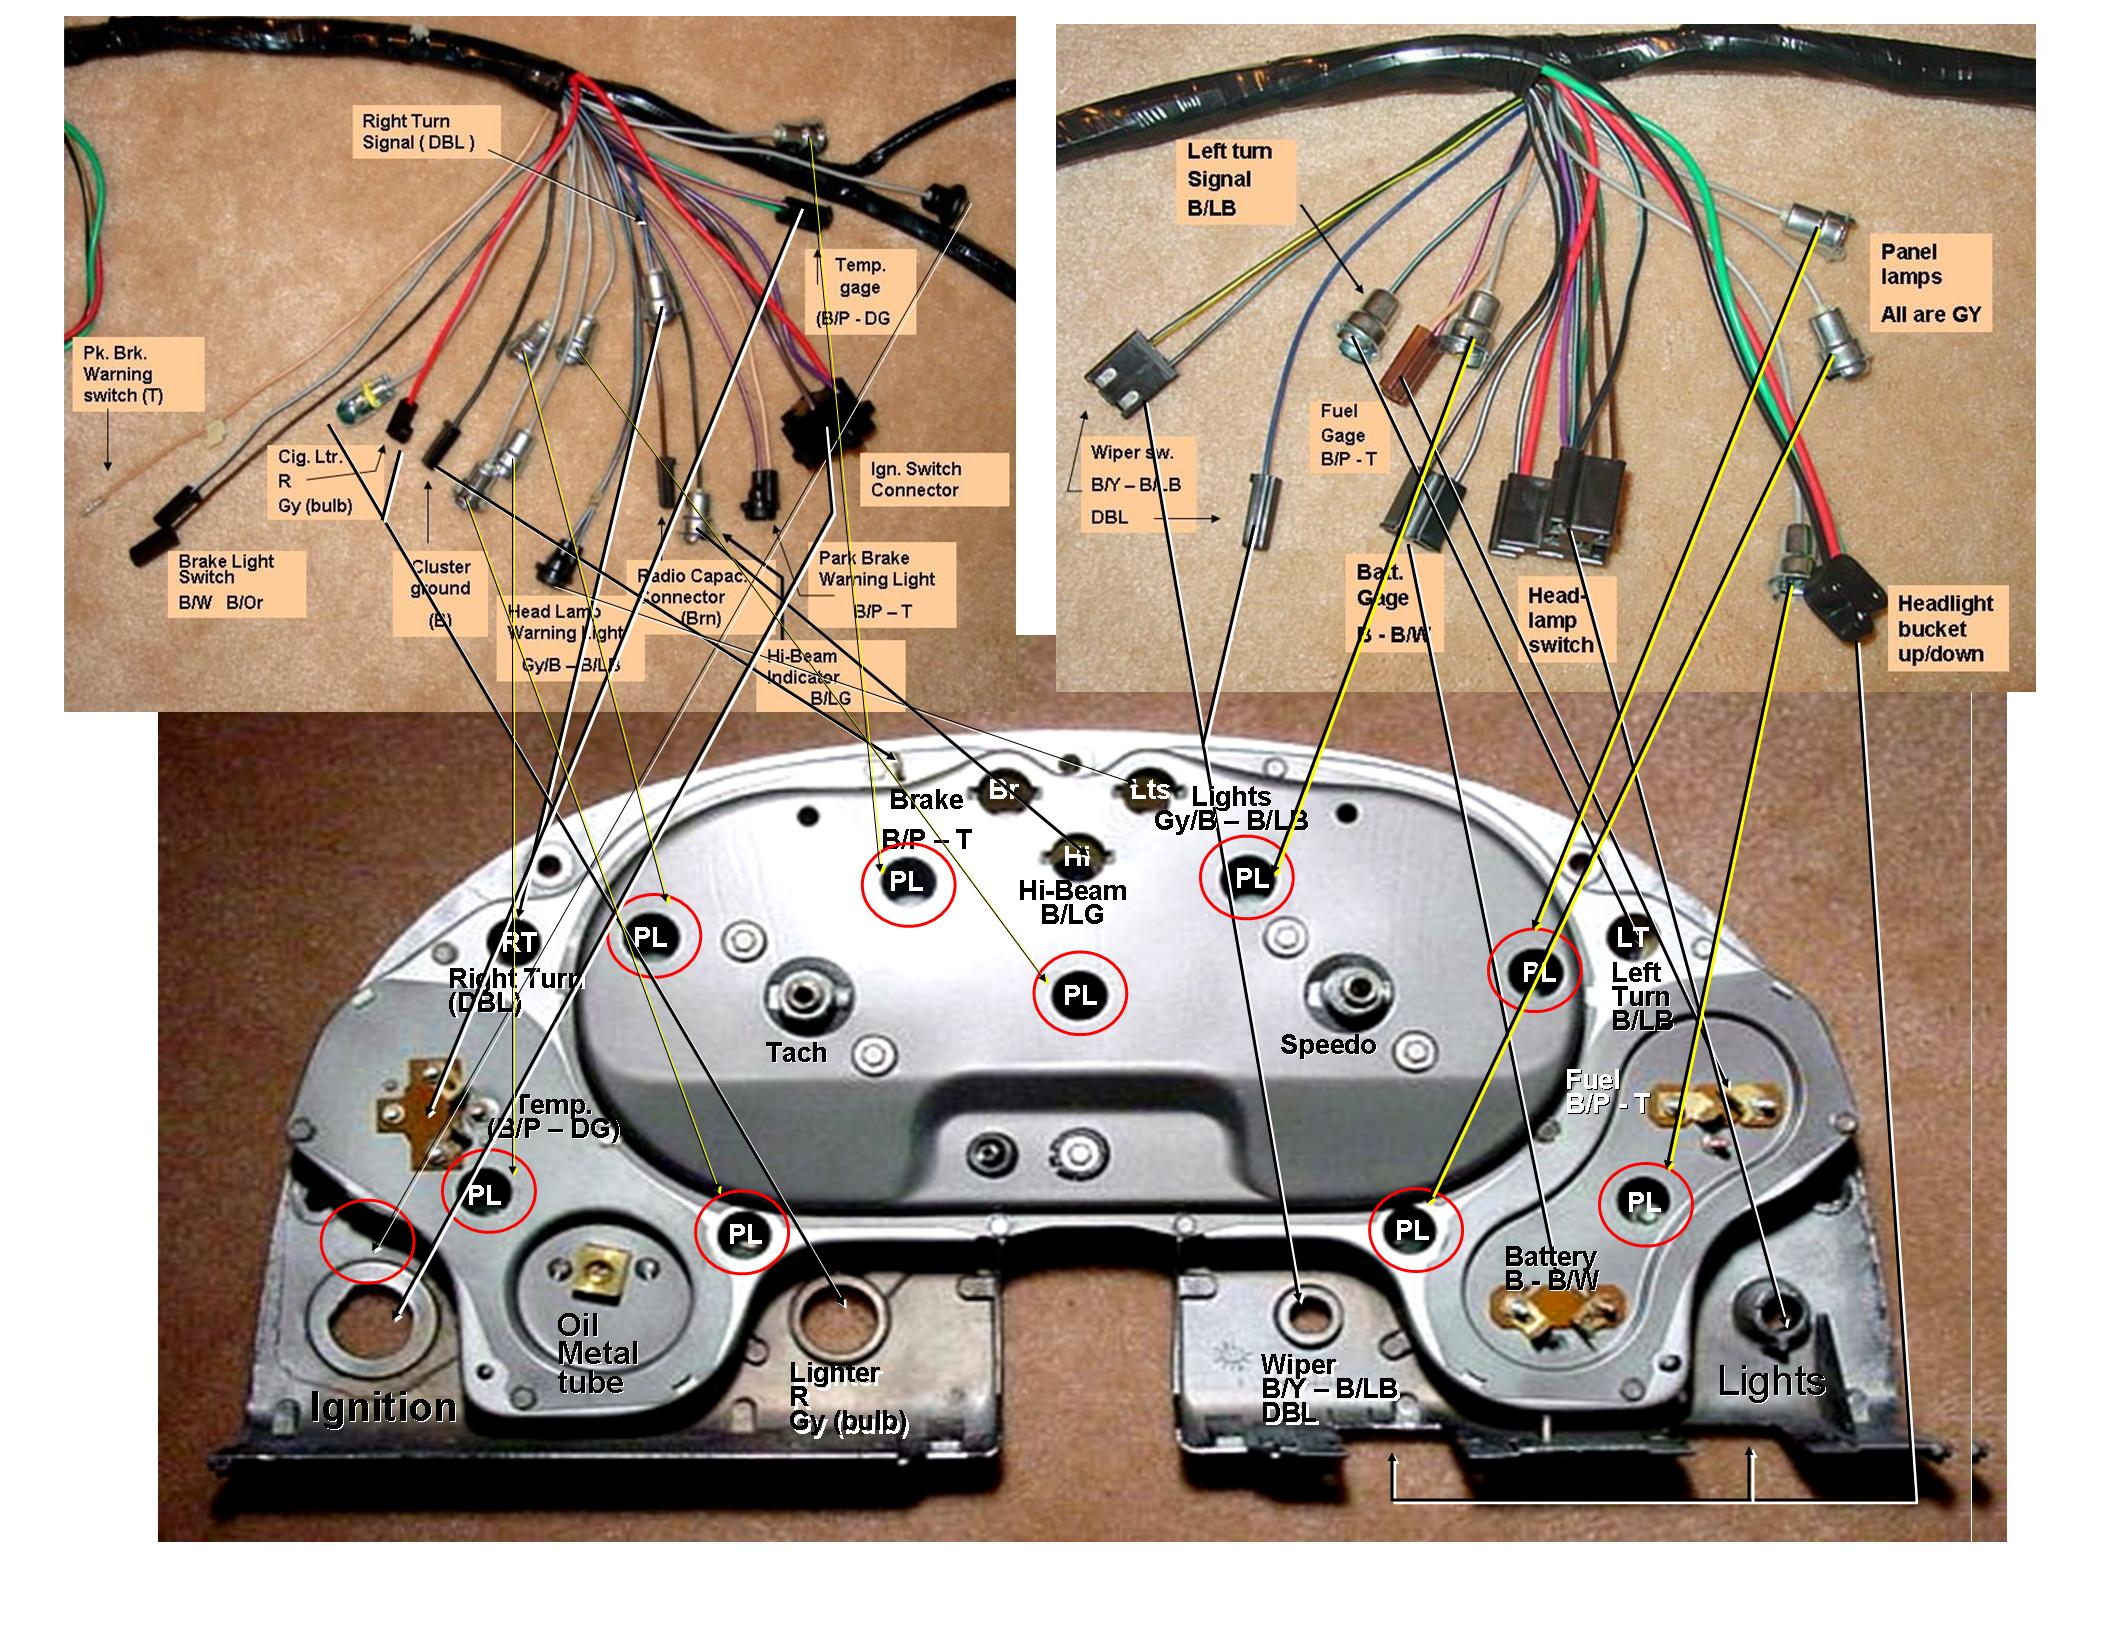 [SCHEMATICS_4PO]  RS_4660] 1966 Mustang Ignition Wiring Diagram Wiring Harness Wiring  Schematic Wiring | 1966 Corvette Wiring Harness |  | Hison Opein Mohammedshrine Librar Wiring 101